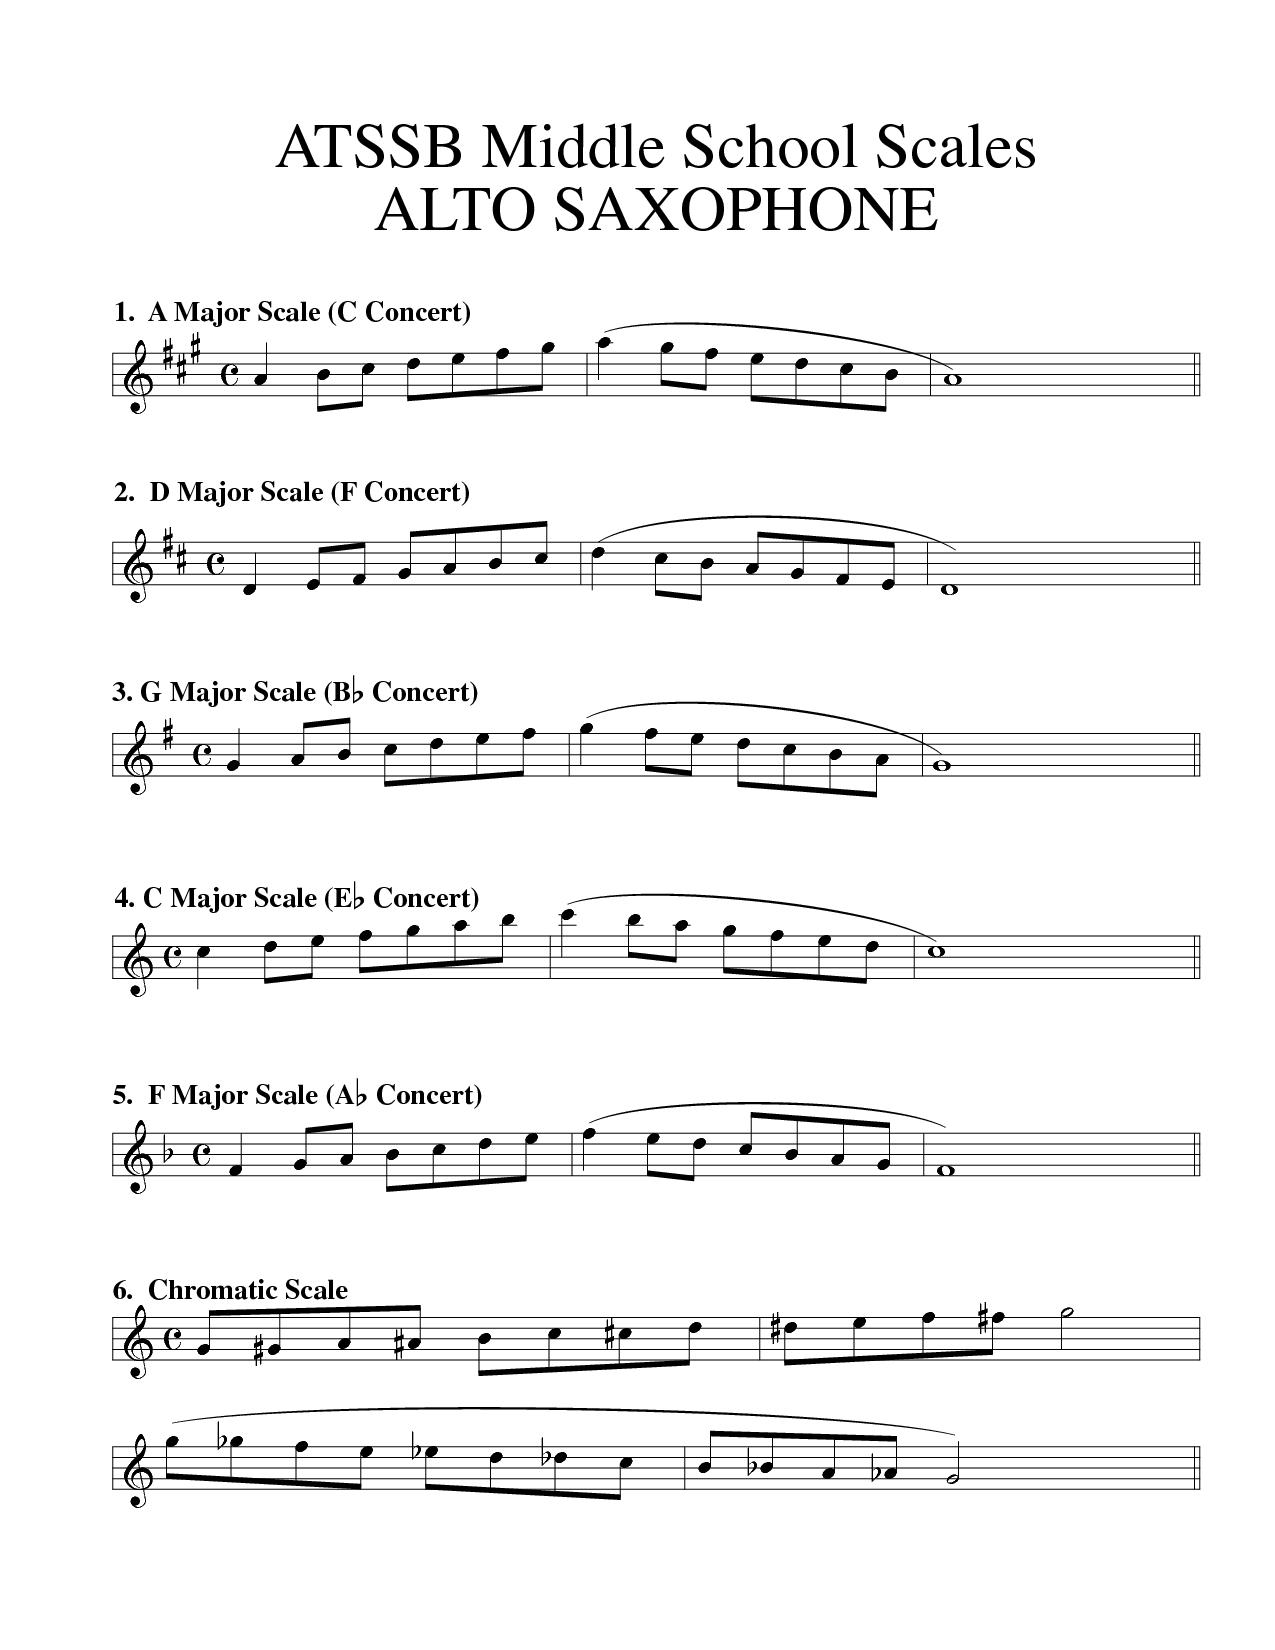 Saxaphone Major Scales In Concert Atssb Middle School Scales Alto